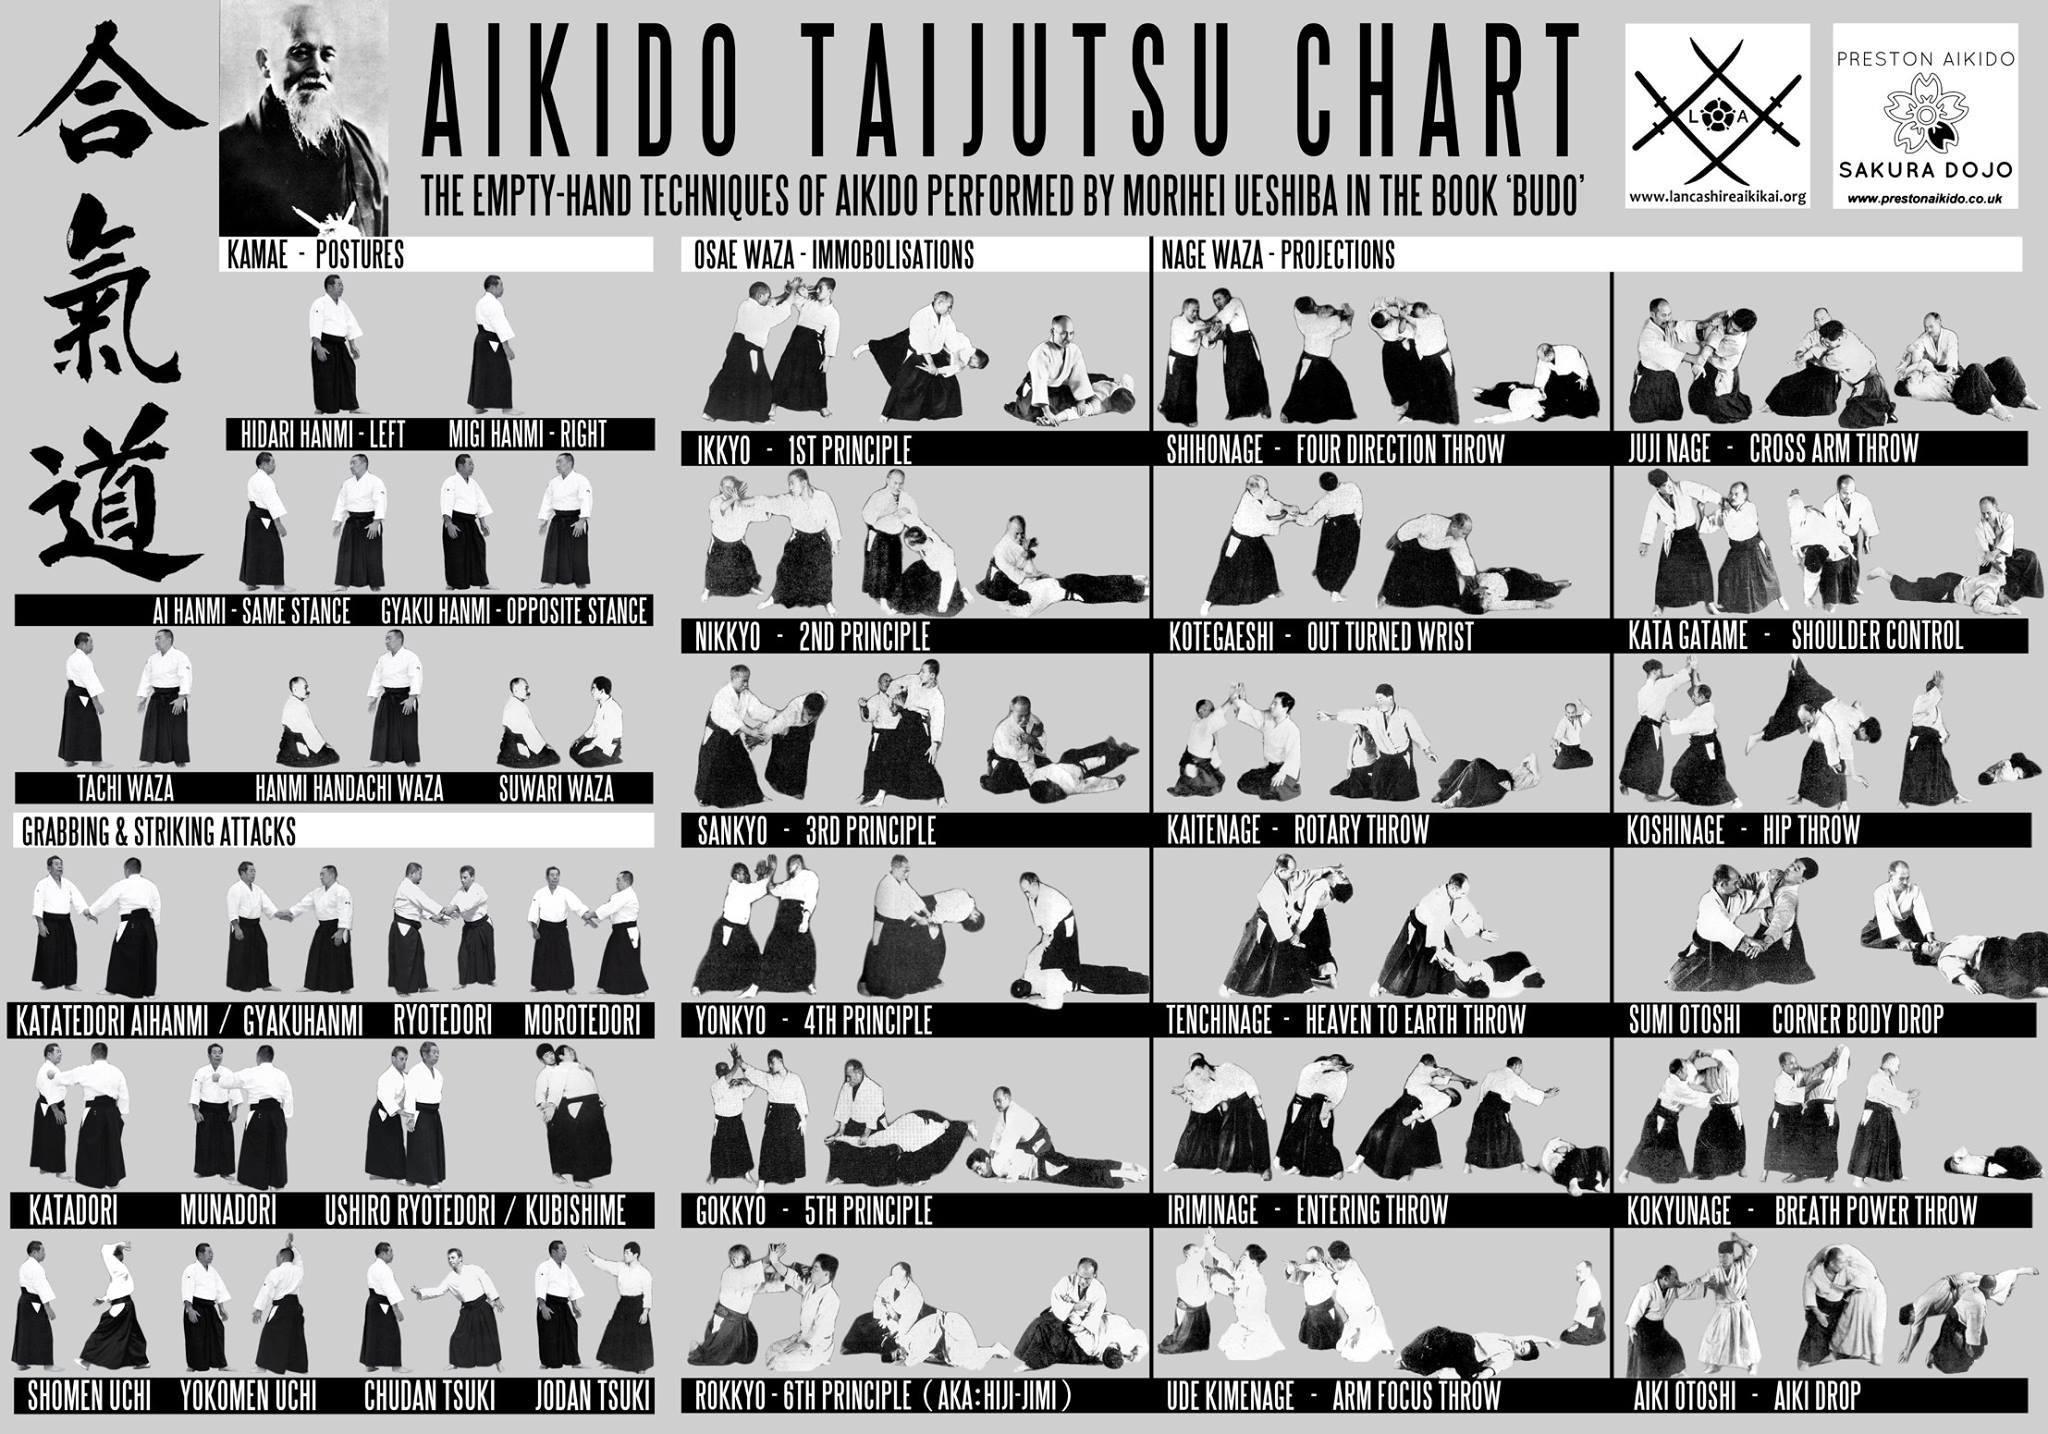 aikido taijutsu chart gowa ryu aikido